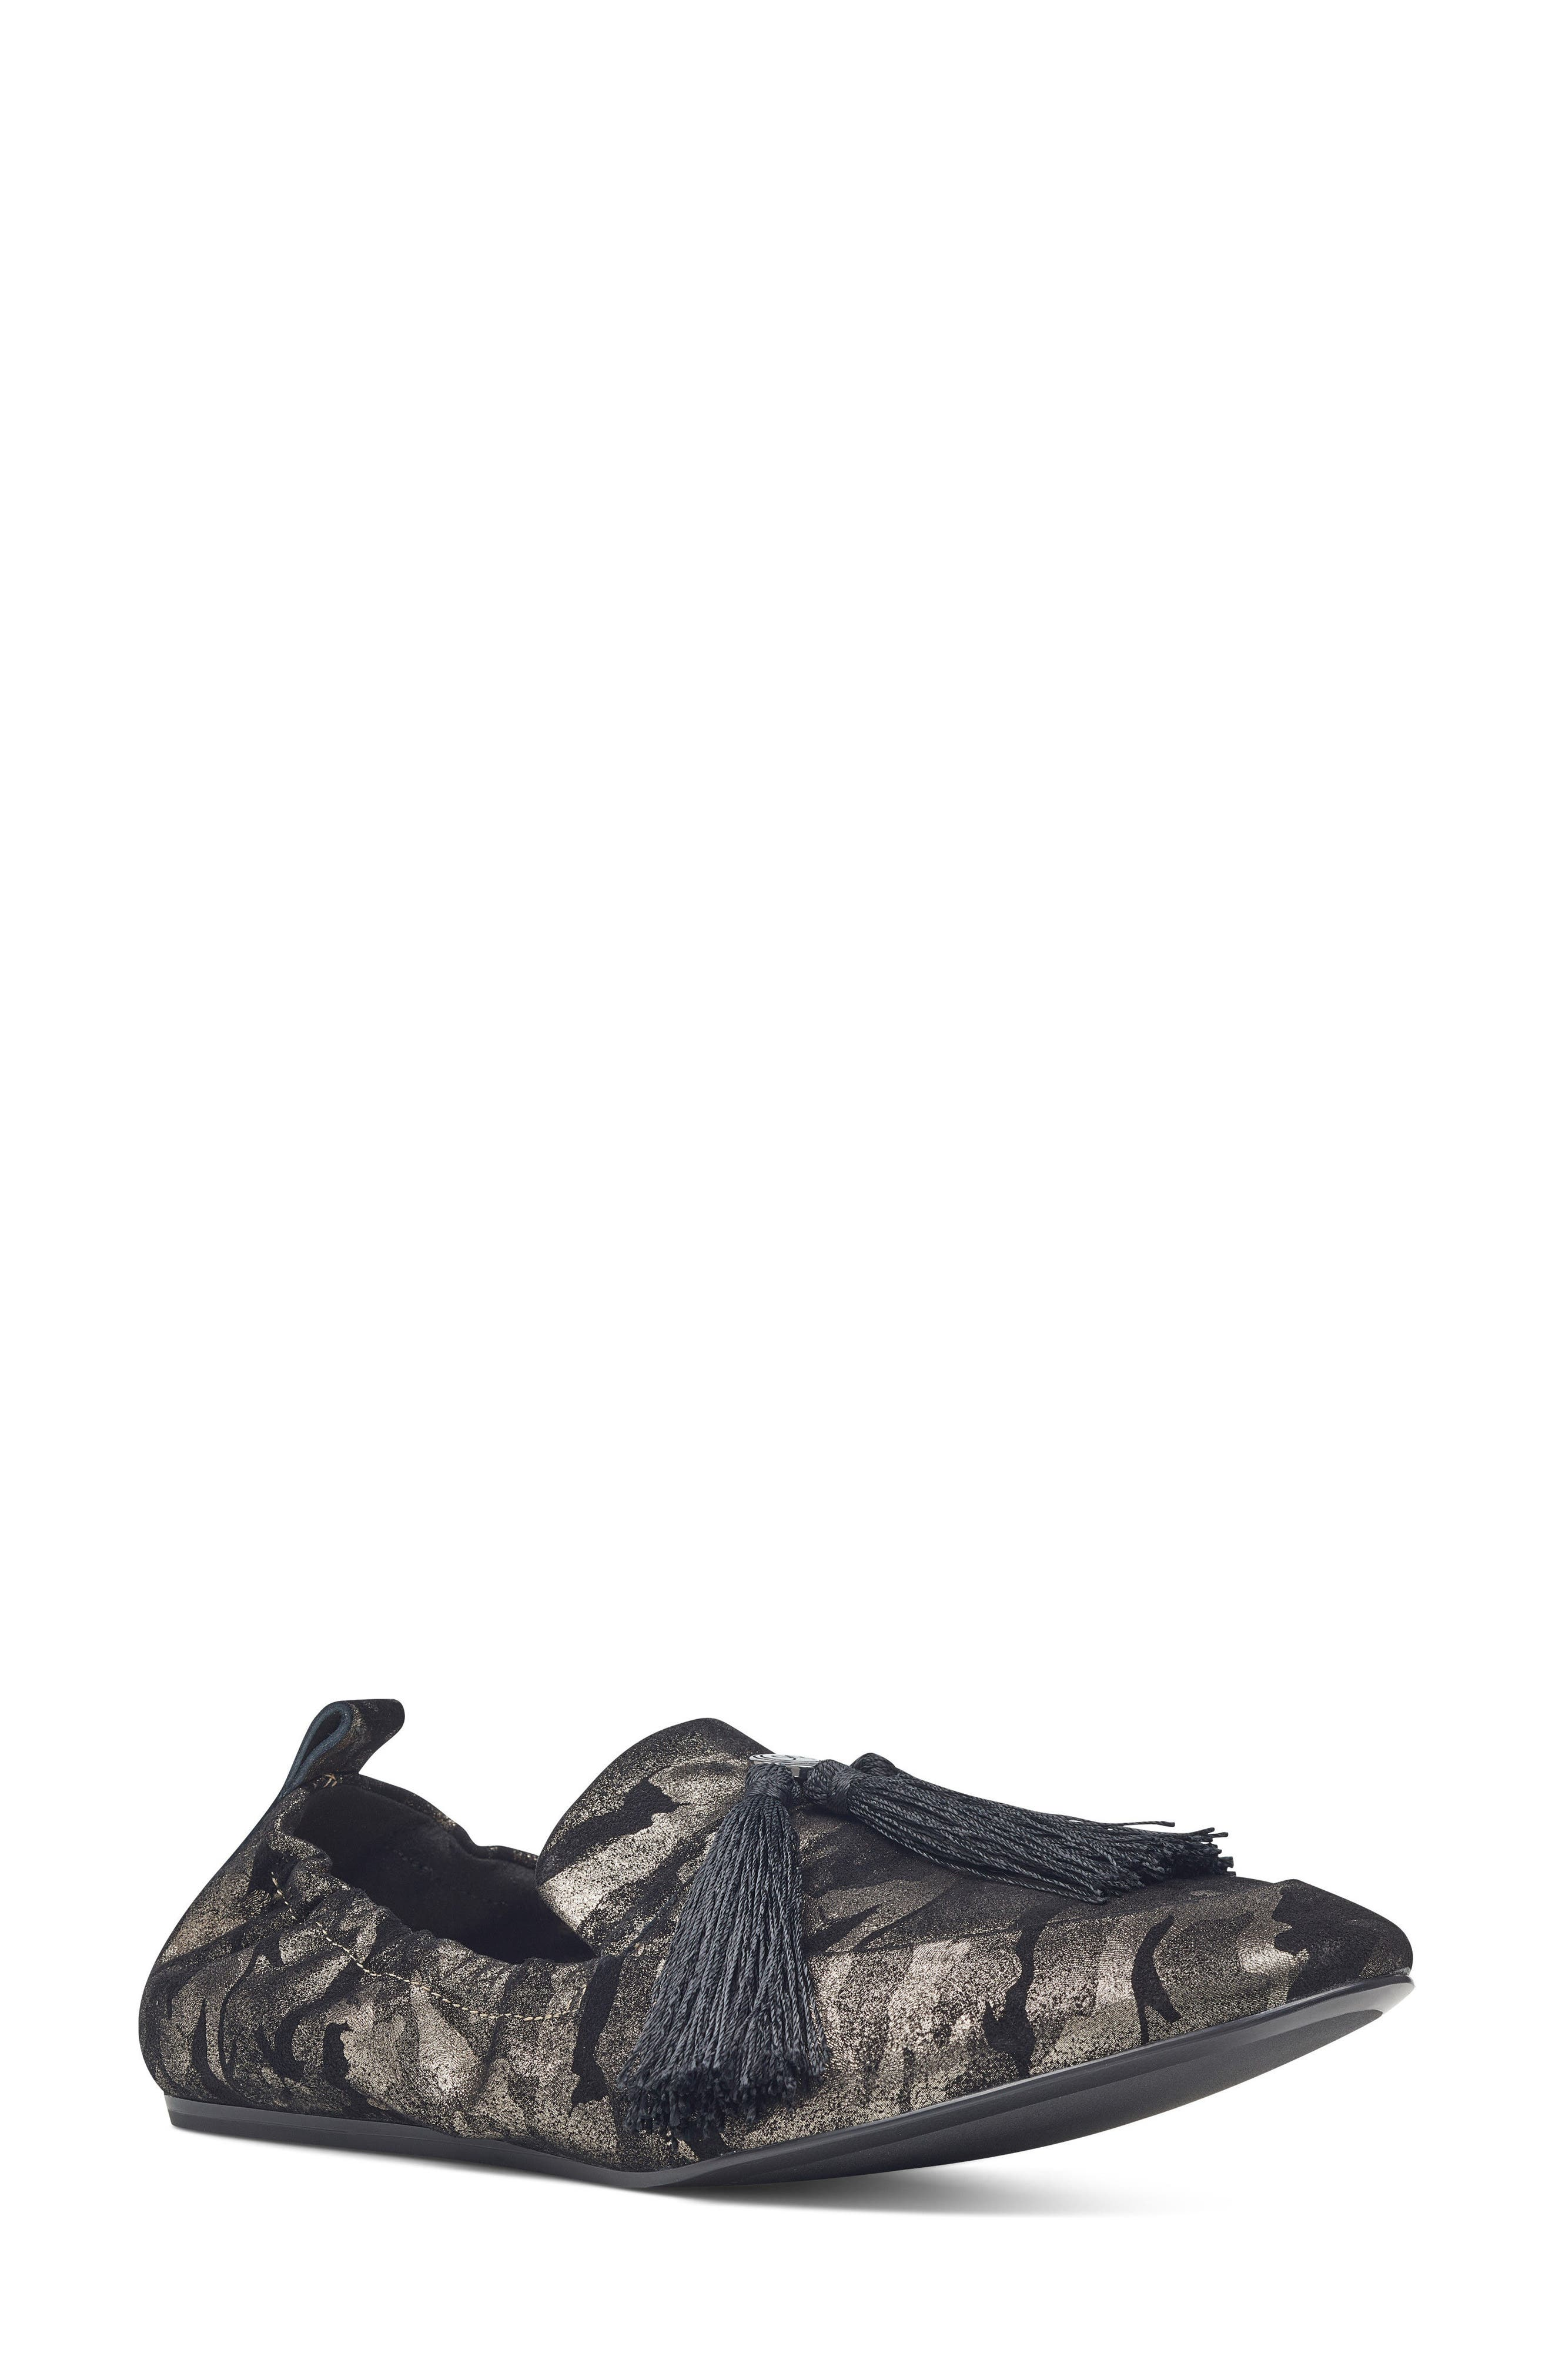 Ballard Tassel Loafer Flat,                         Main,                         color, Pewter Leather